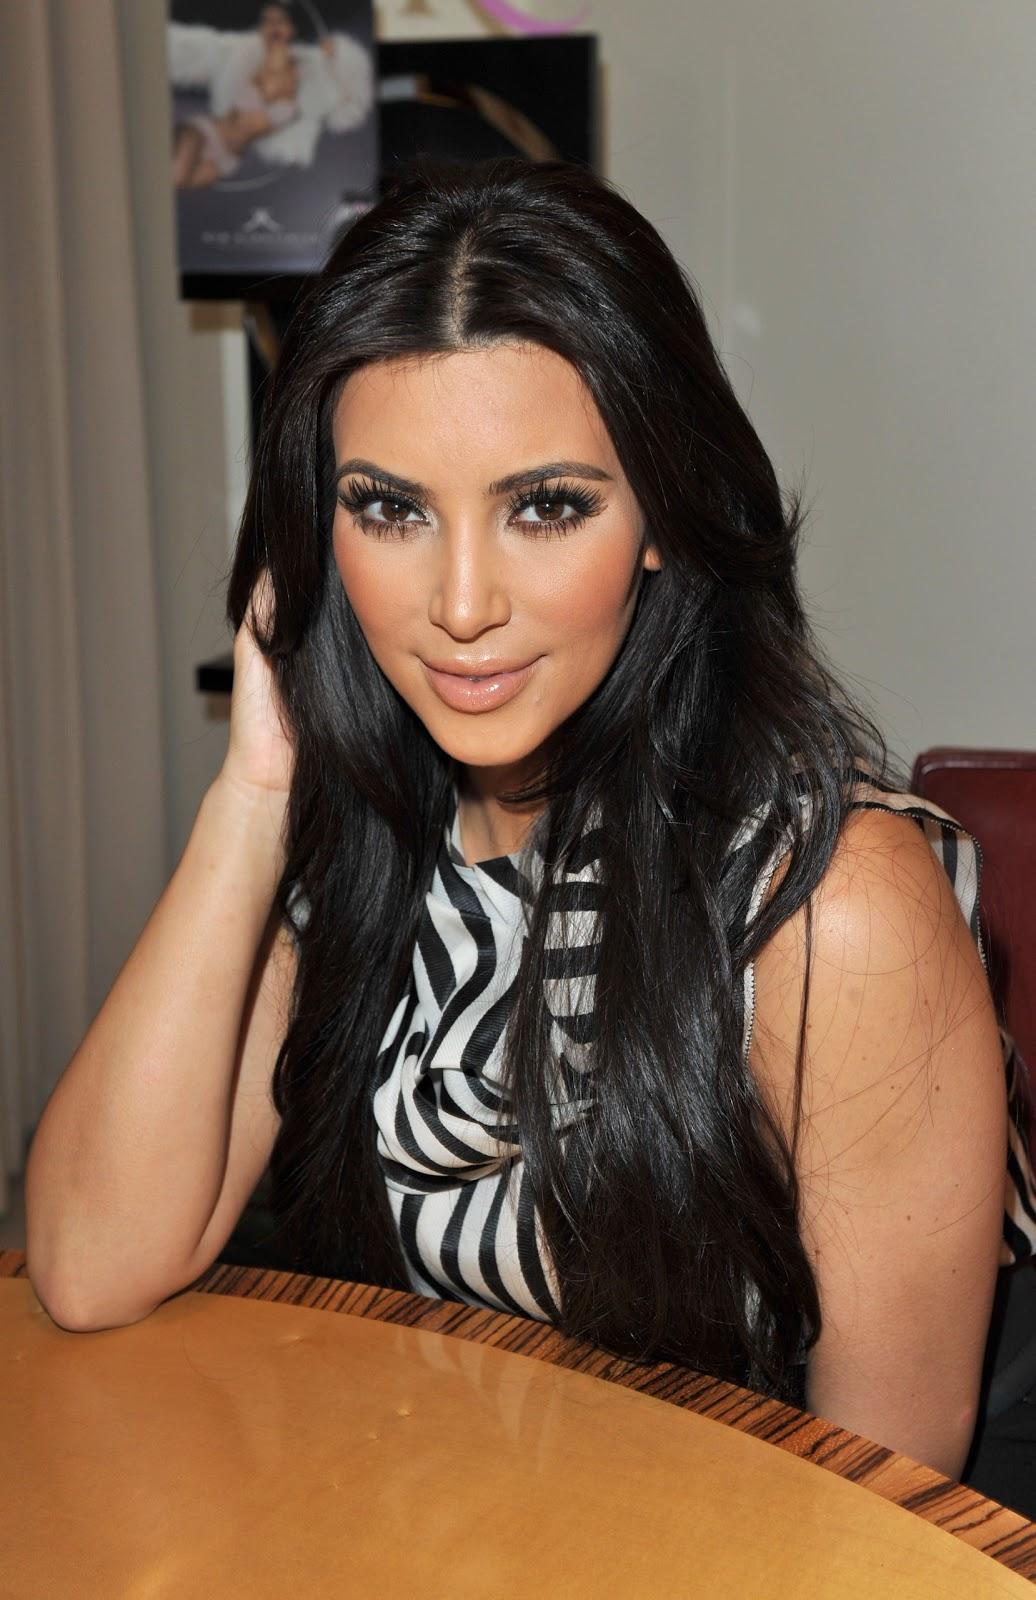 photoshoot sexy Kim kardashian